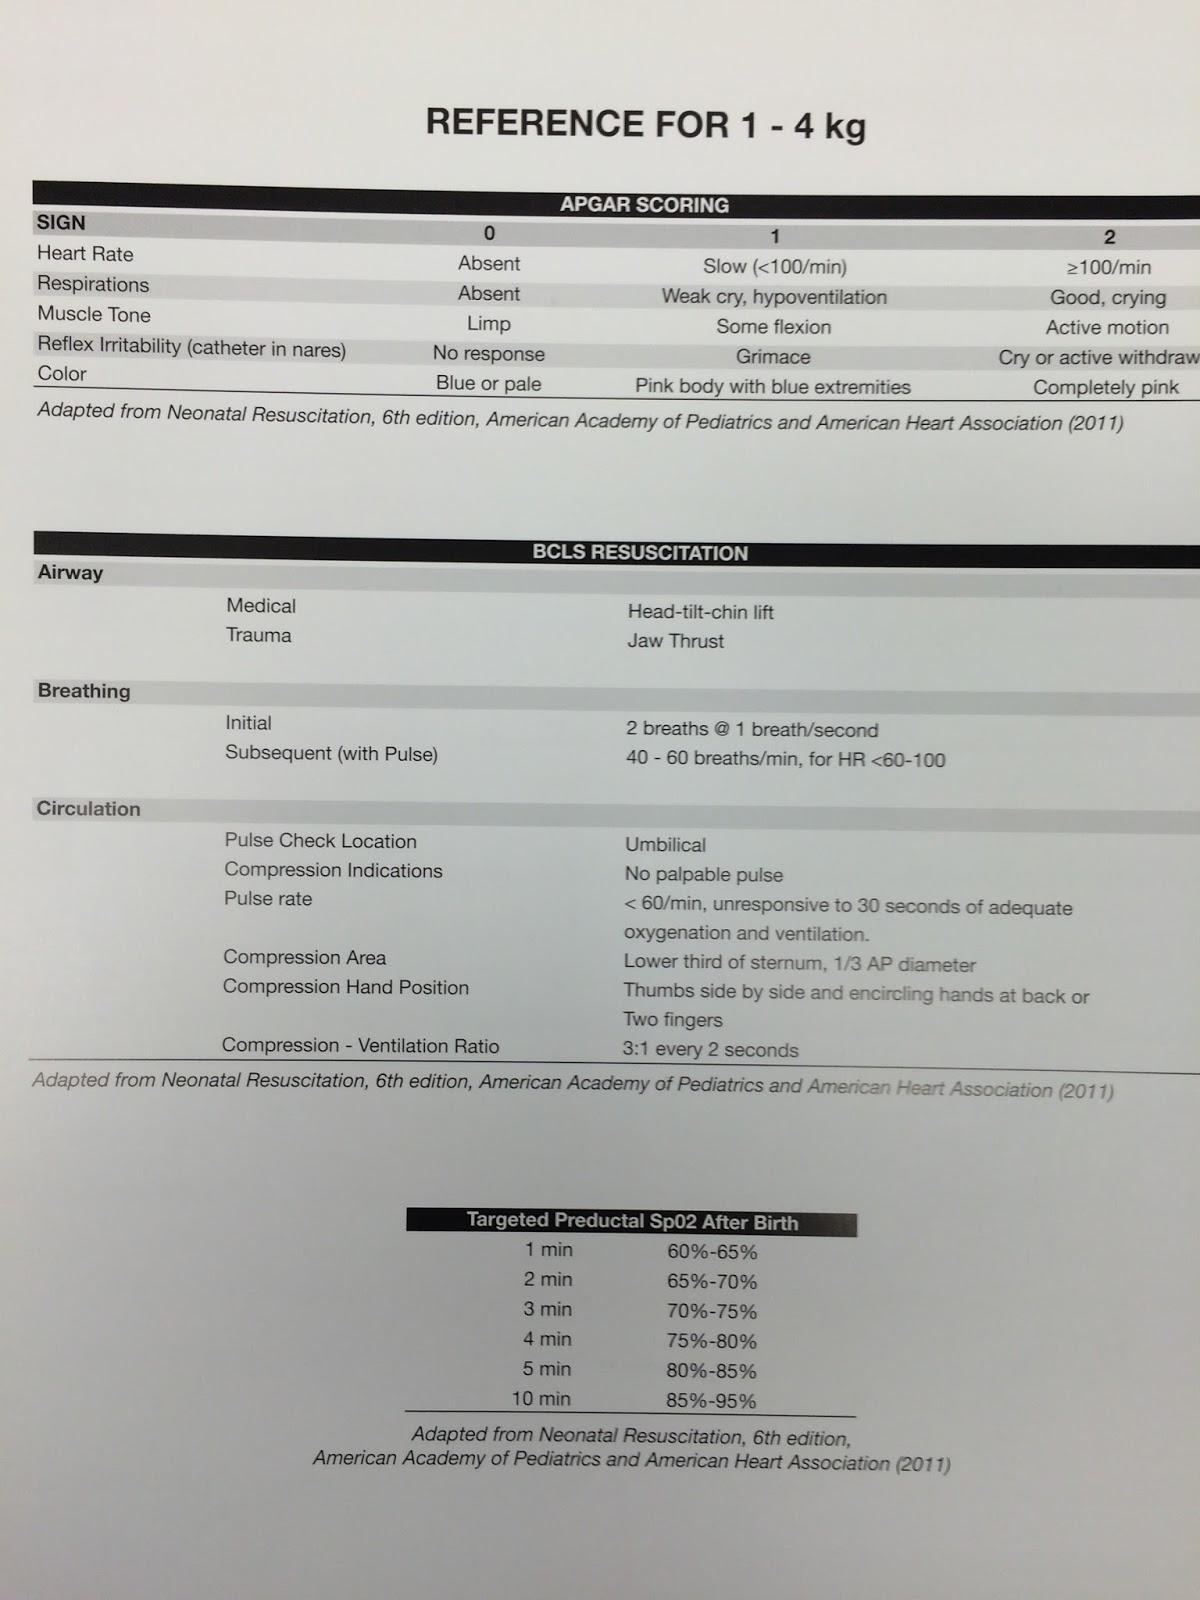 Some important details Dr Smithu0027s ECG Blog